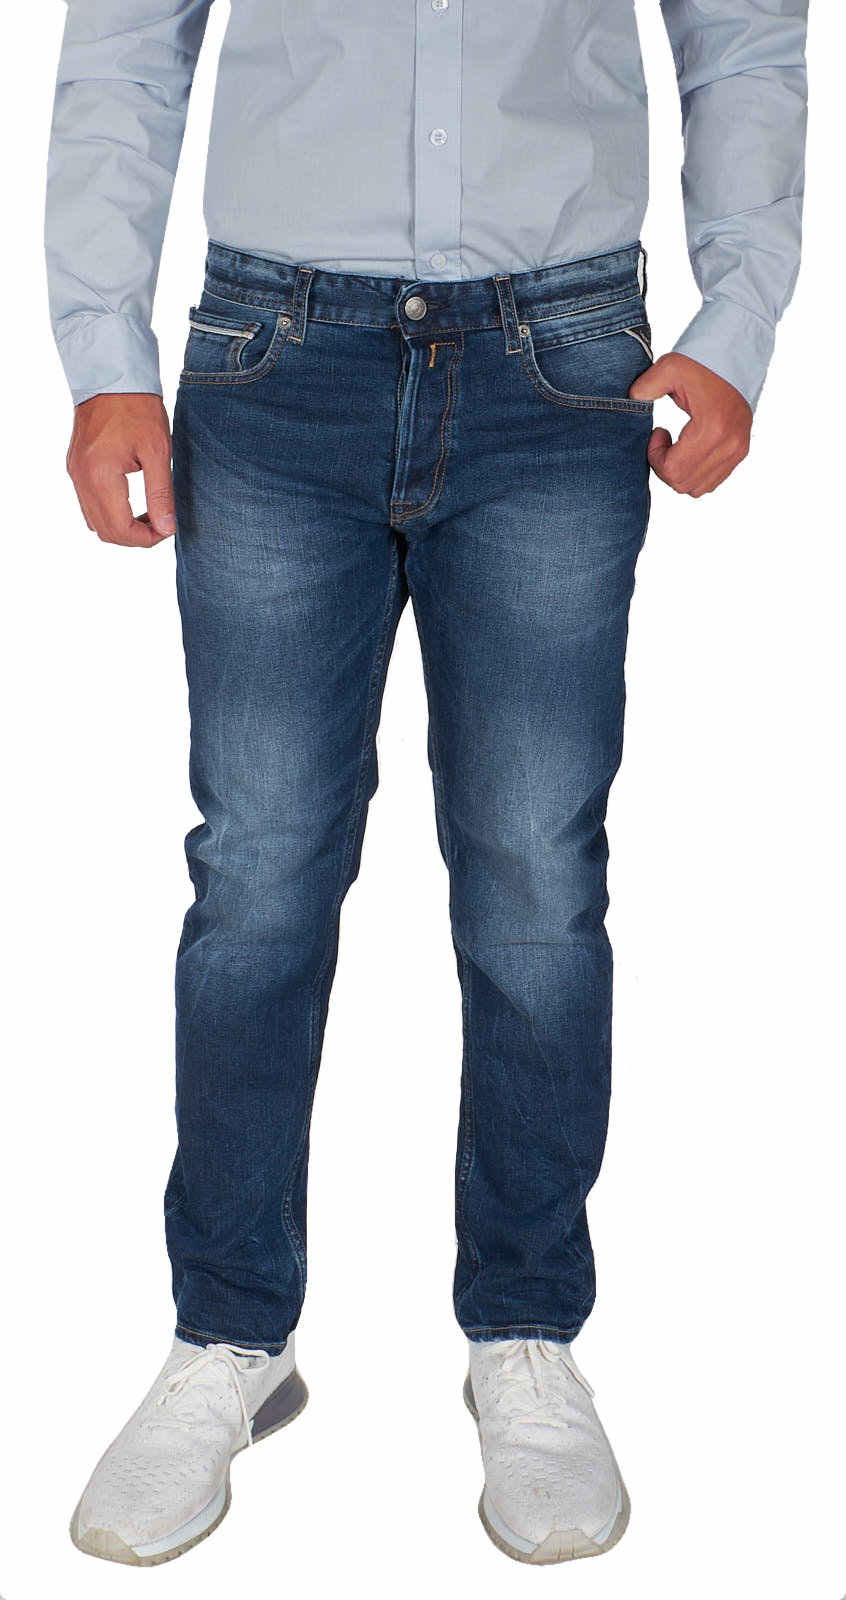 REPLAY-Jeans-Herrren-Grover-Straight-Fit-Stretch-Hose-Denim-MA972-000-93C-334